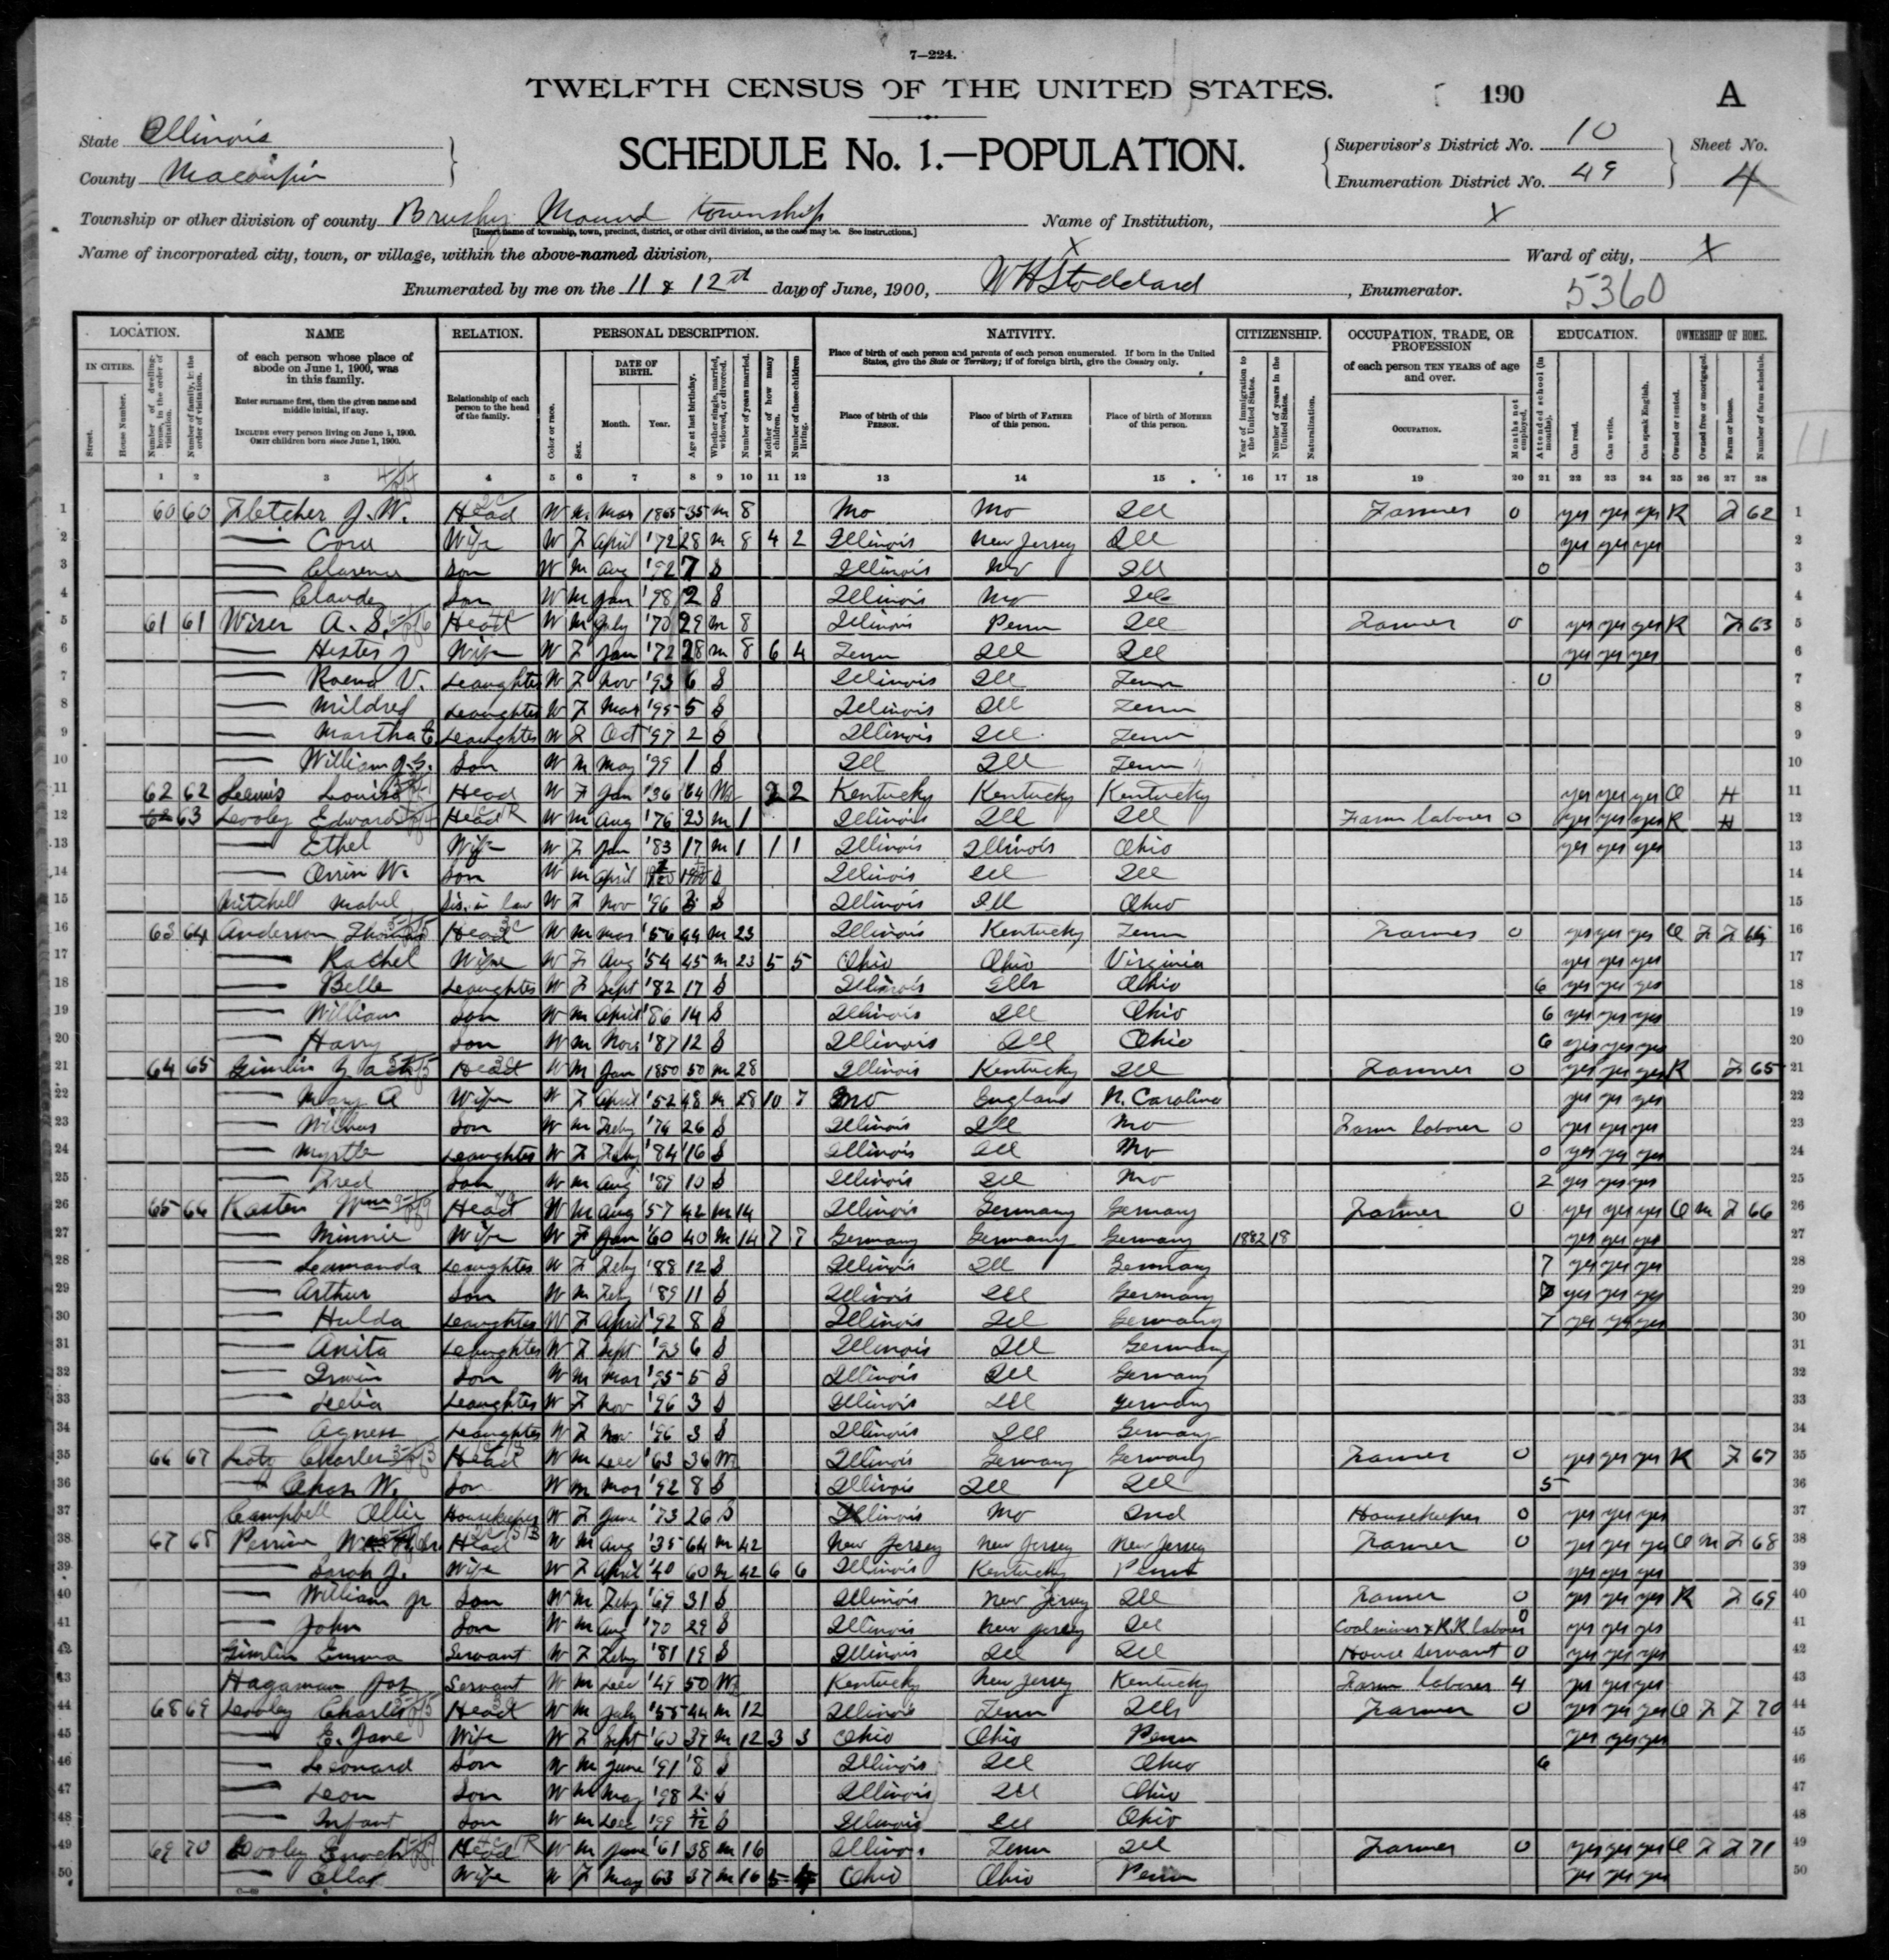 Illinois: MACOUPIN County, Enumeration District 49, Sheet No. 4A